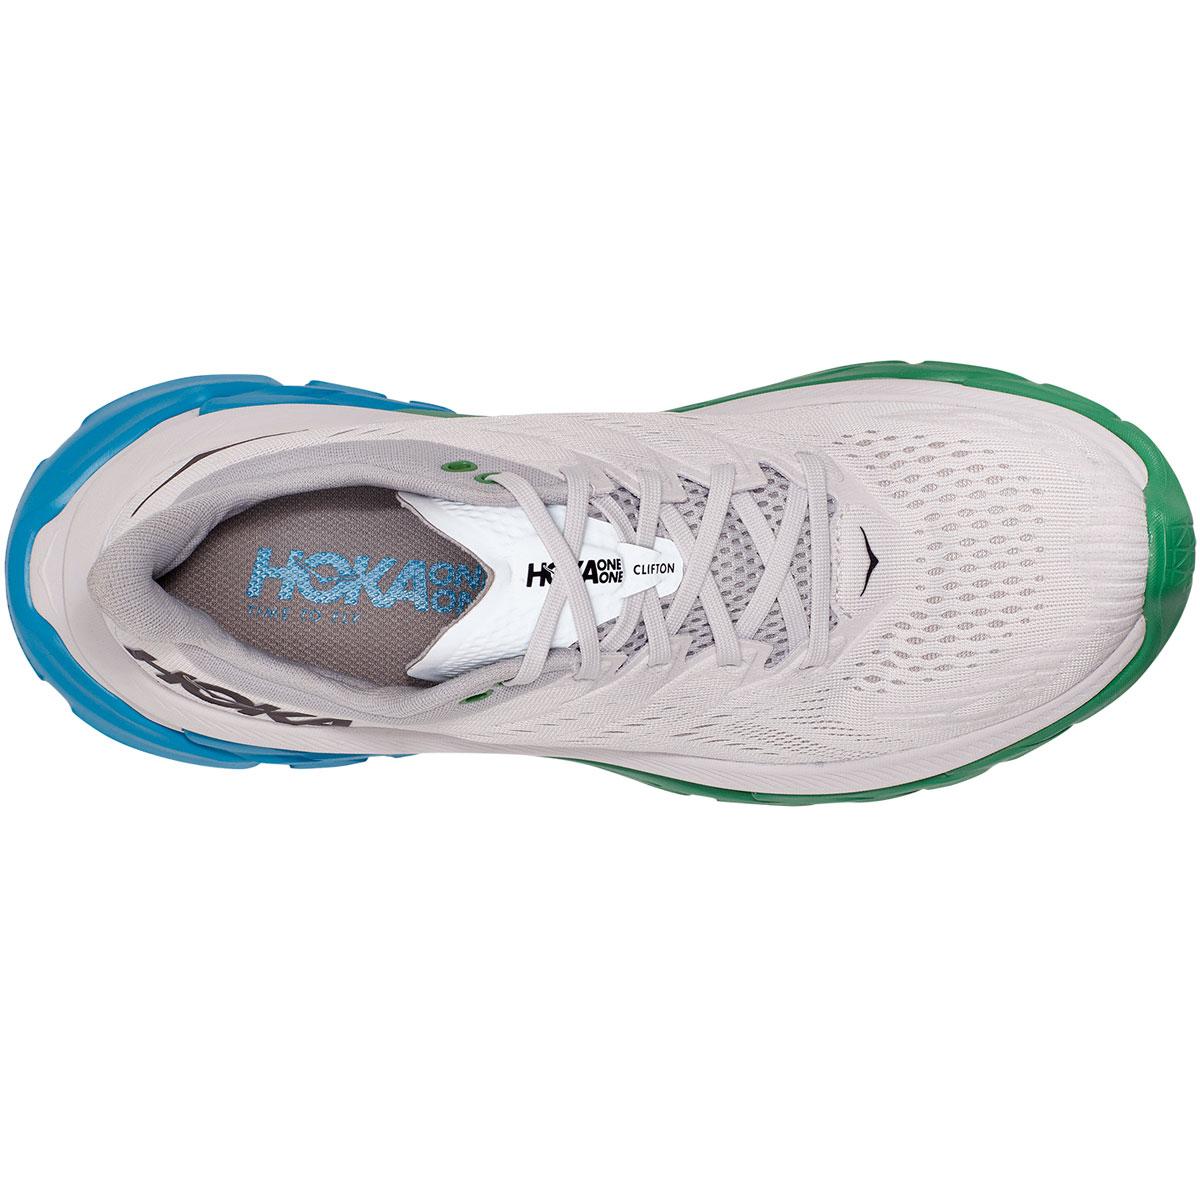 Men's Hoka One One Clifton Edge Running Shoe - Color: Nimbus Cloud - Size: 7 - Width: Regular, Nimbus Cloud, large, image 2